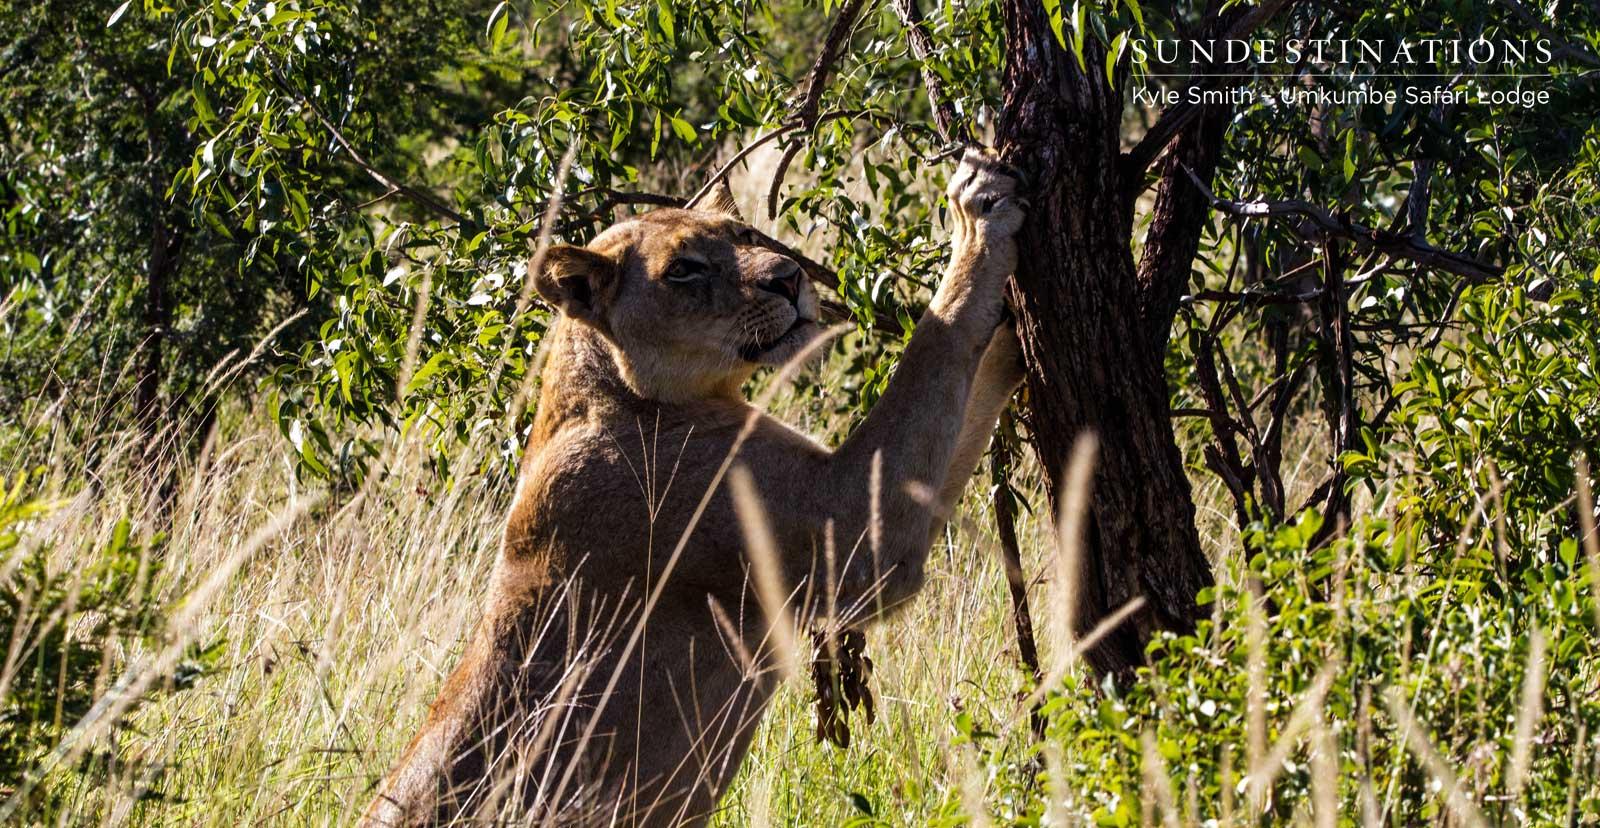 Mhangeni Lionesses on Patrol